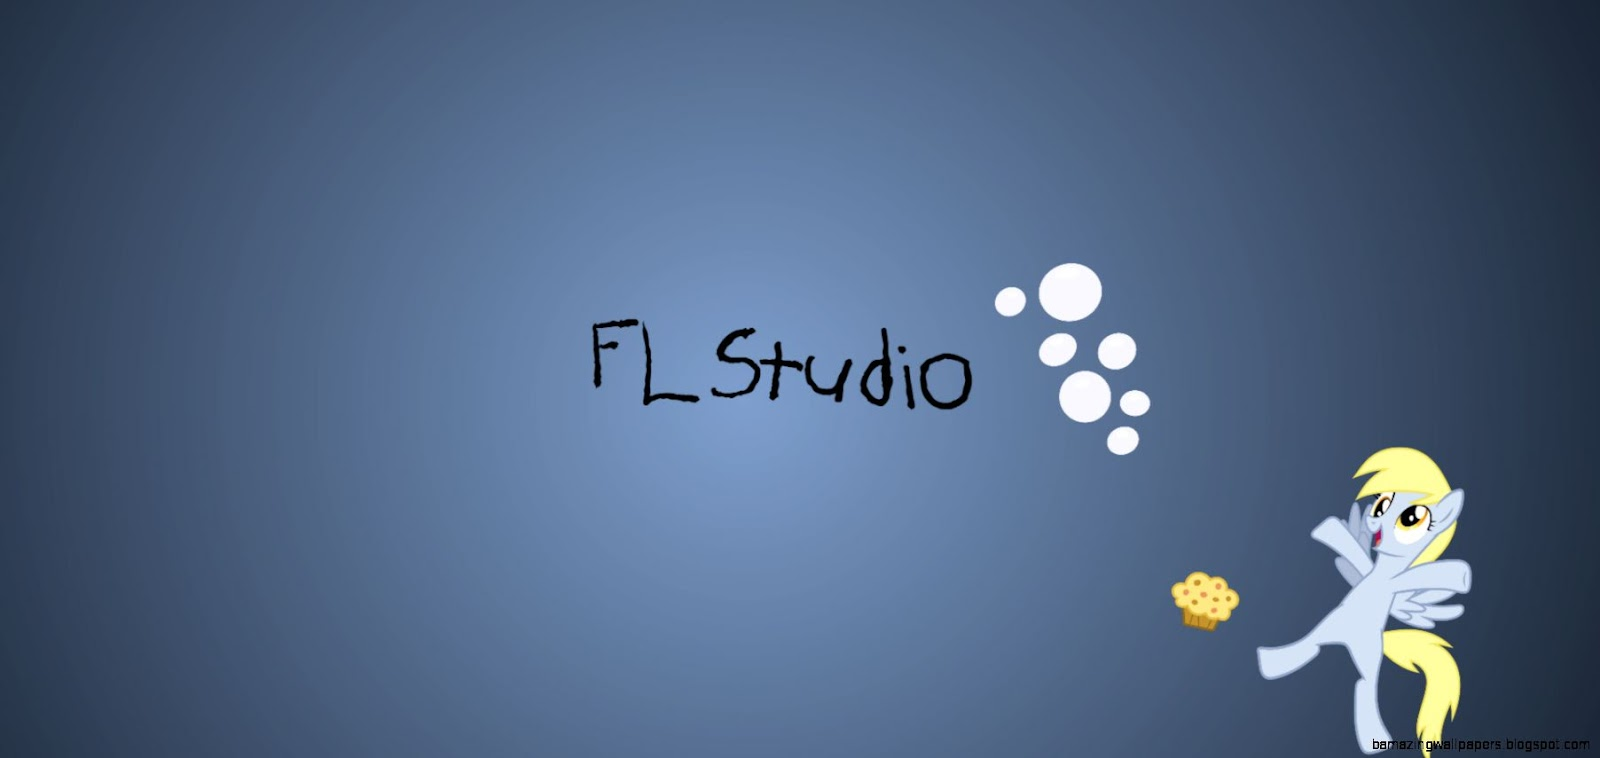 fl studio background wallpaper